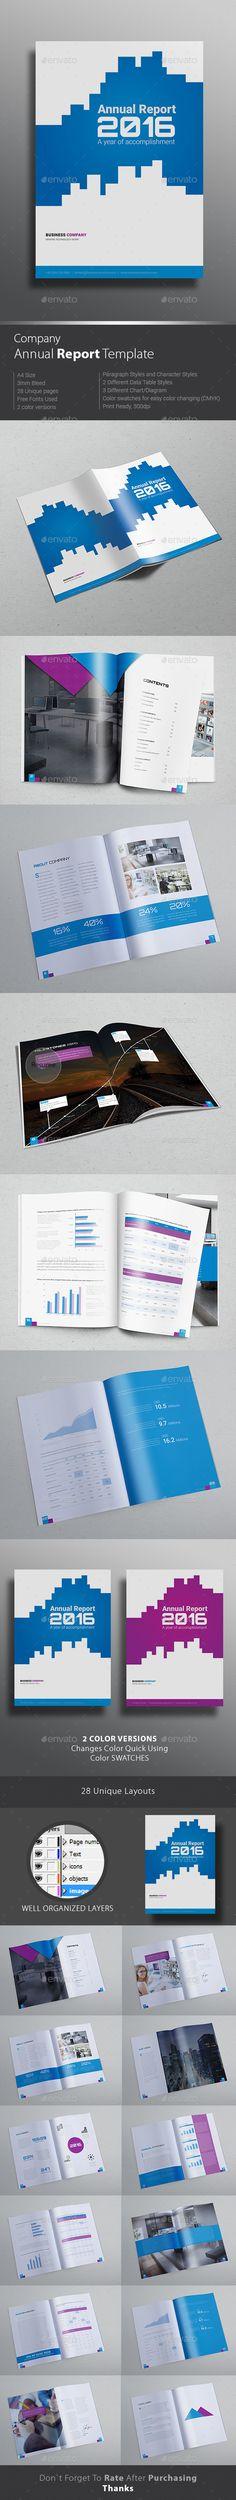 Company Annual Report Design Template #design Download: http://graphicriver.net/item/company-annual-report-design-template/12466842?ref=ksioks